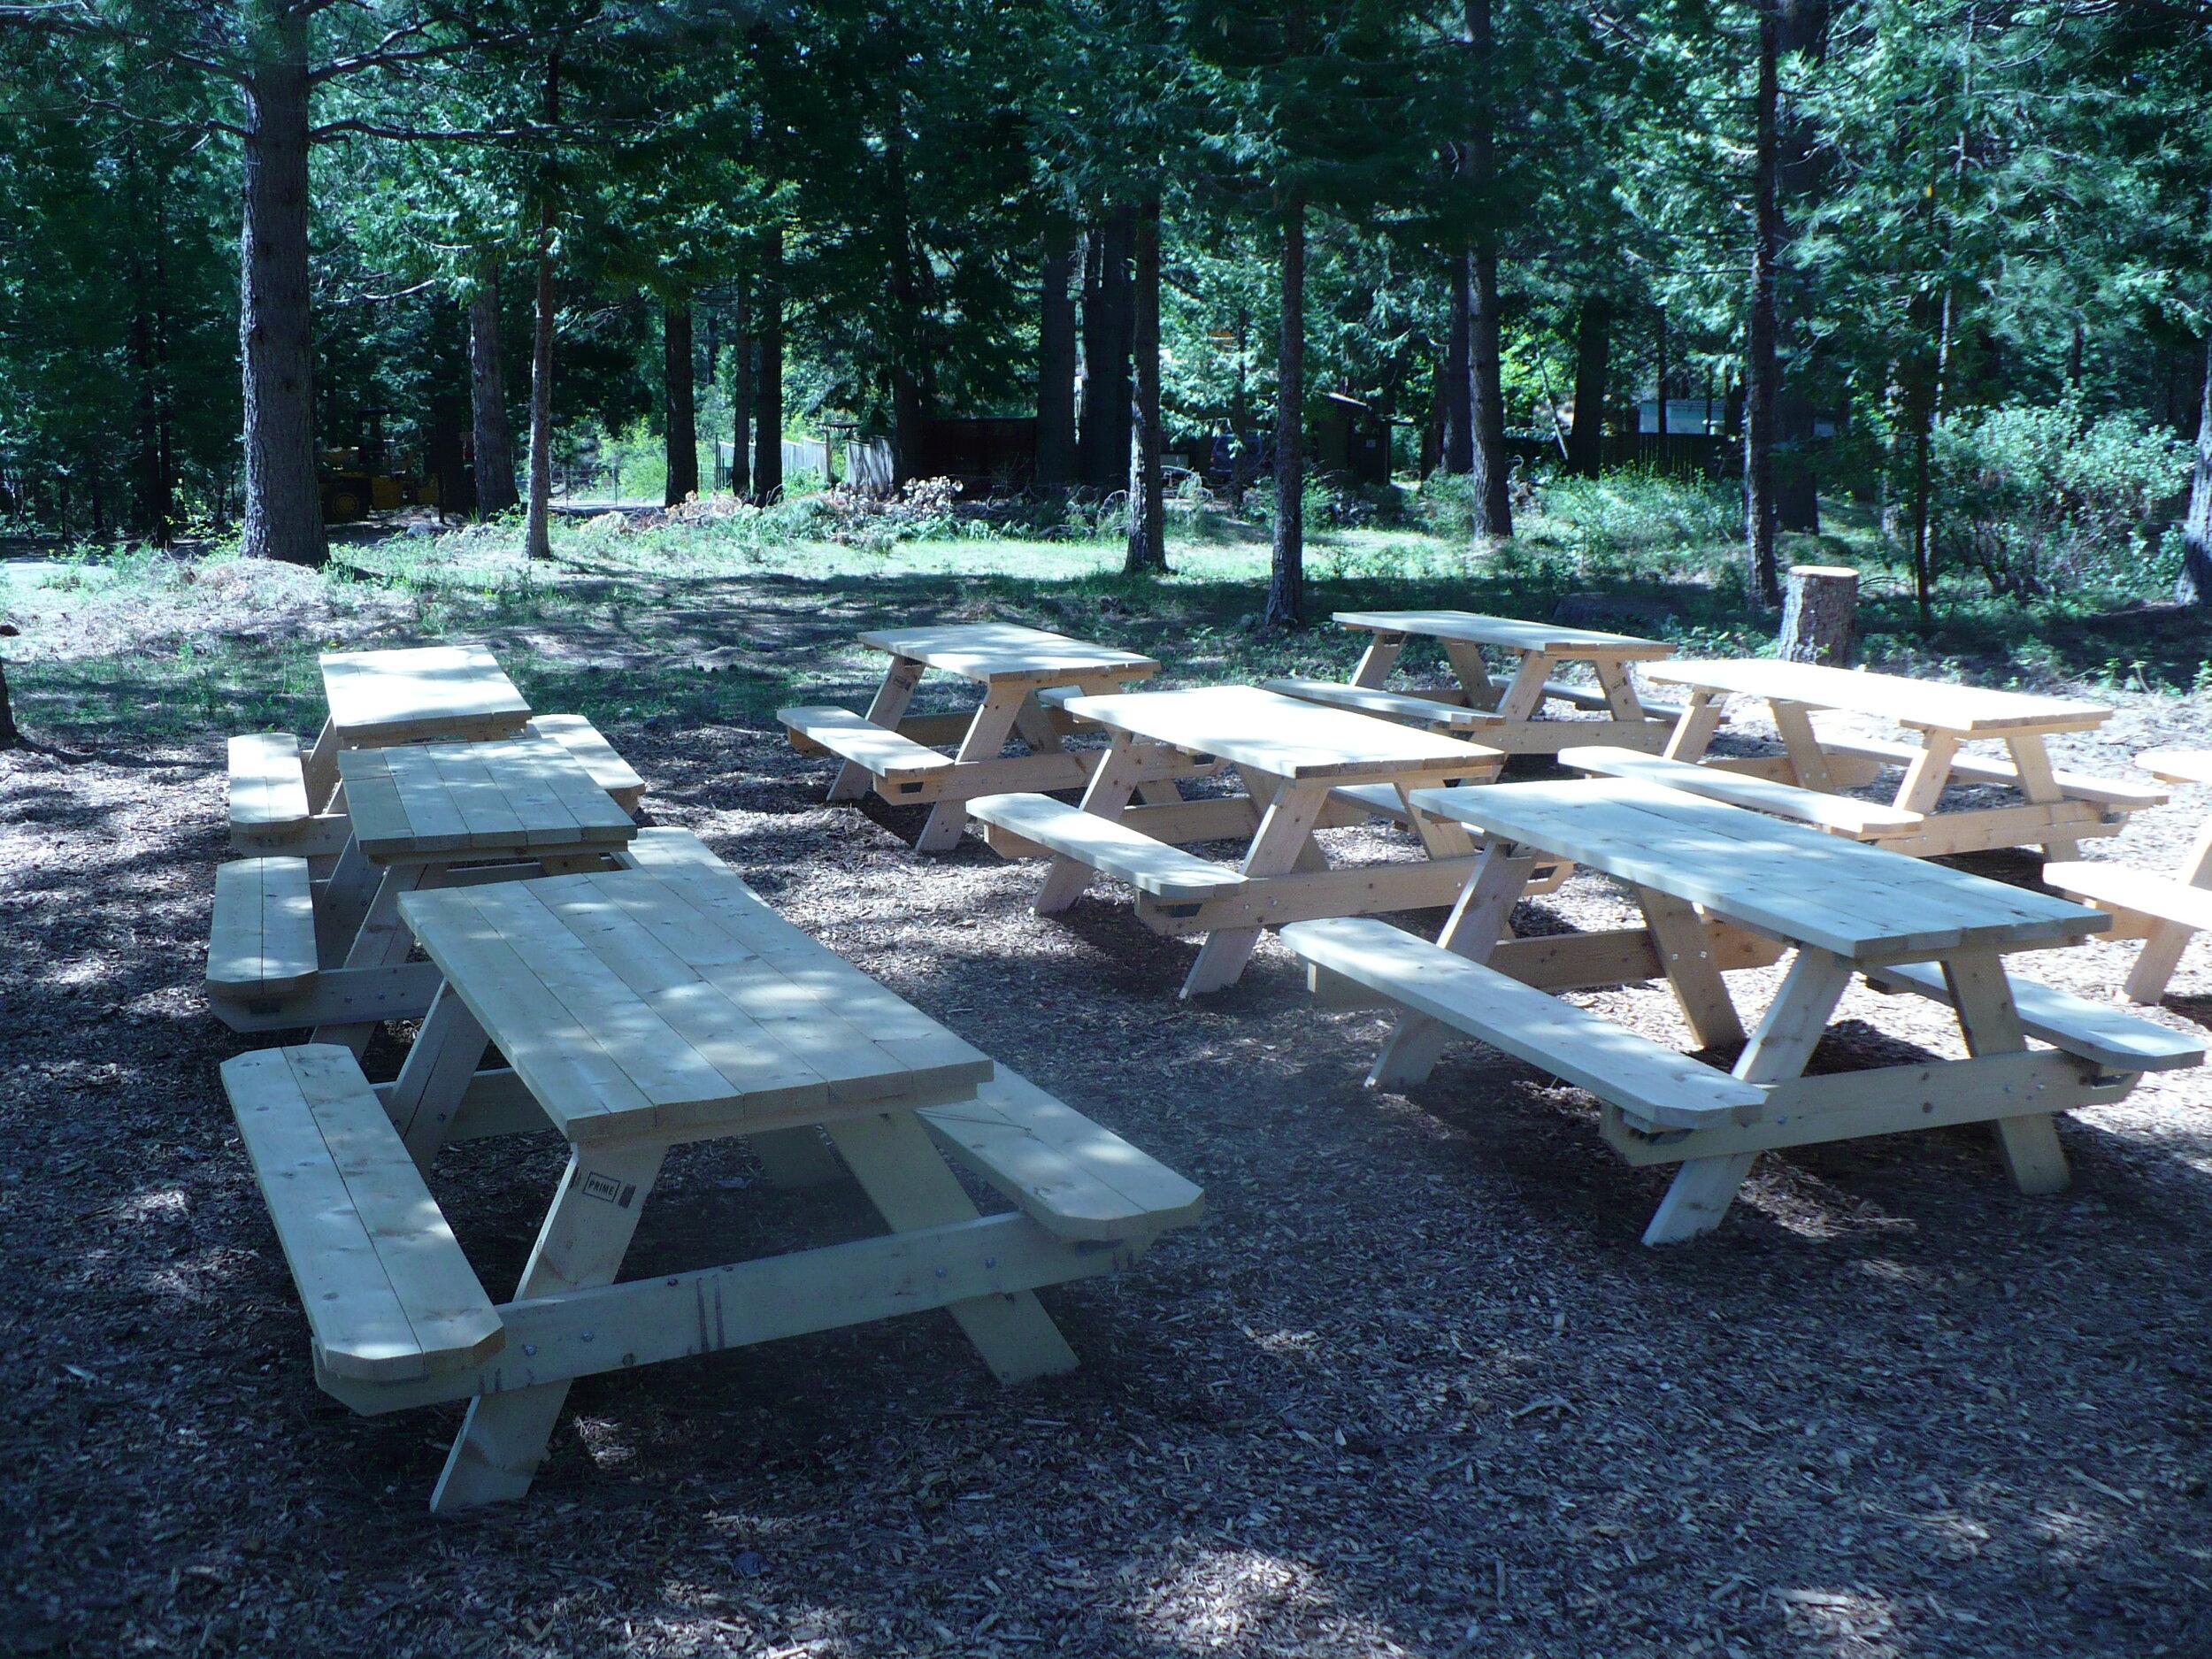 Outdoor Picnic Area